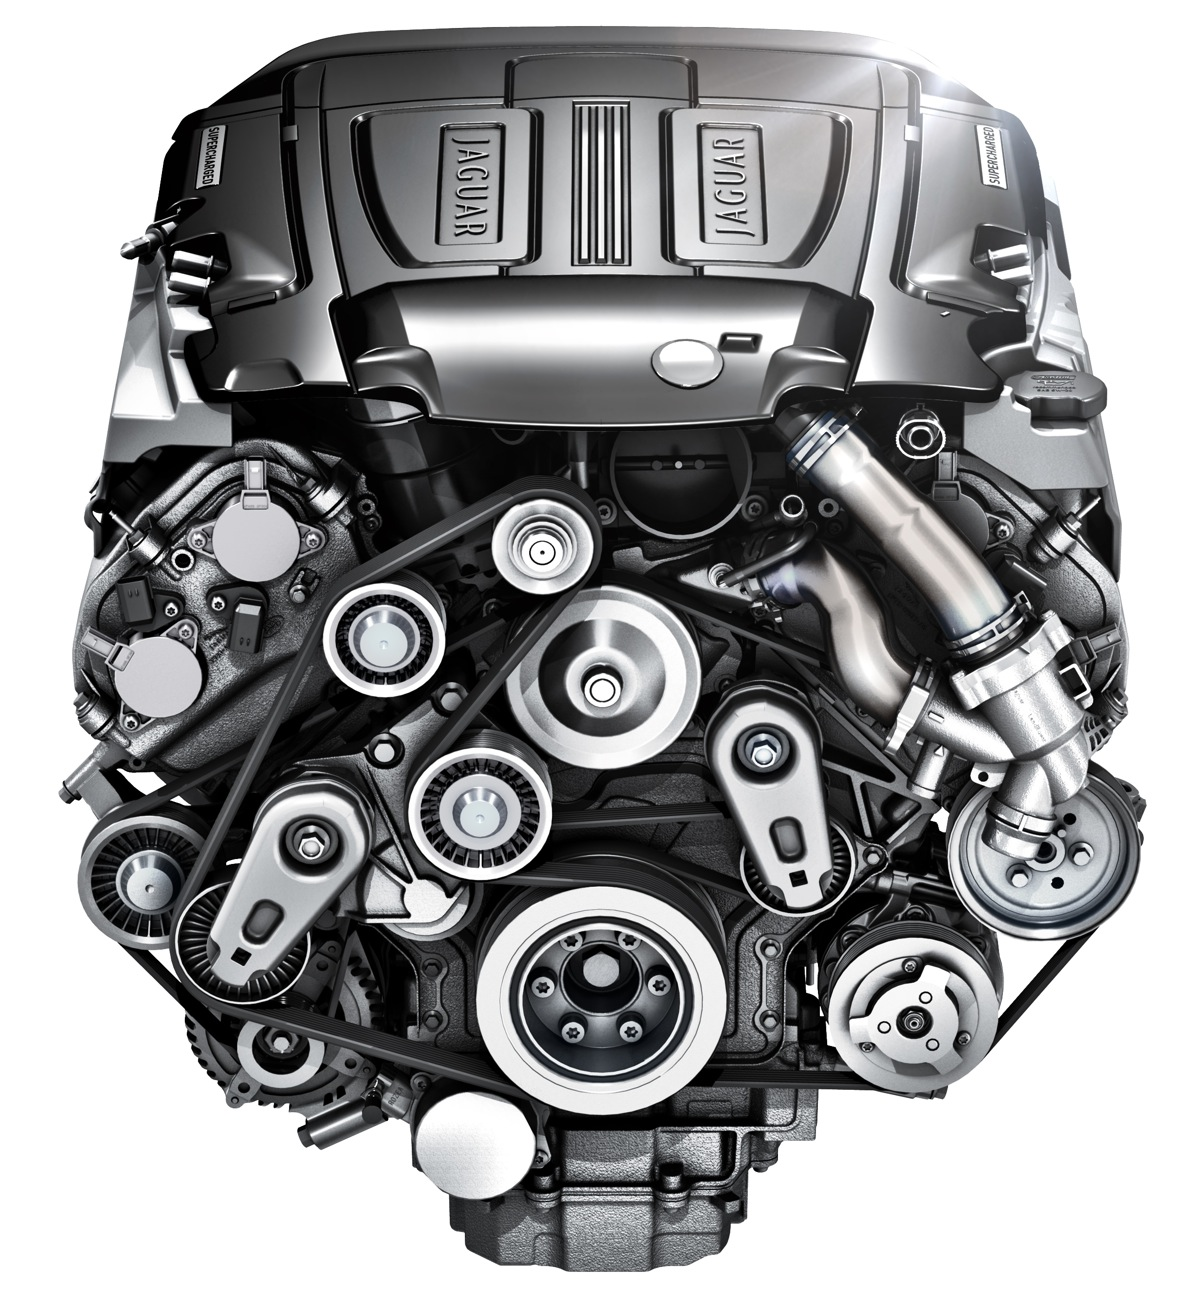 bb supercharged sale used oem engine jaguar miles catalog xjr for block complete xkr engines